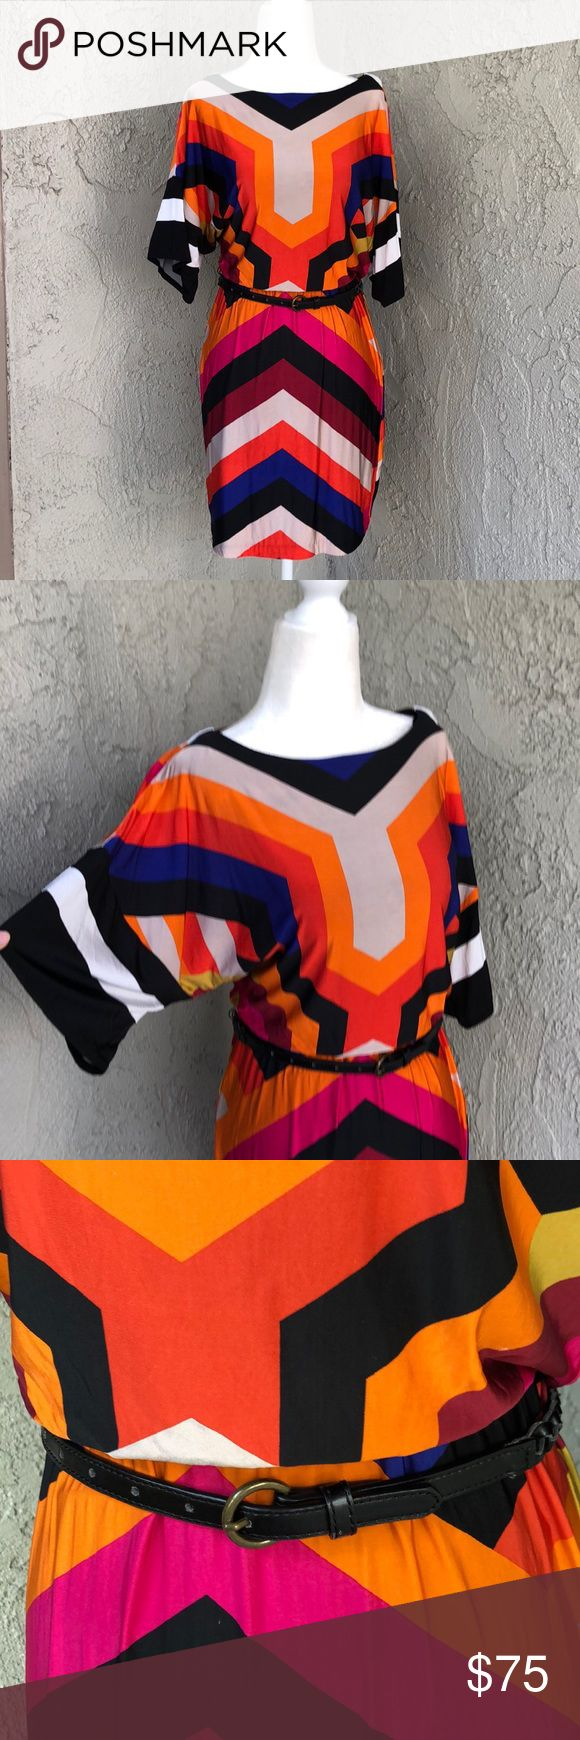 Trina Turk Geometric Print Belted Dolphin Dress 4 This vibrant geometric print d…